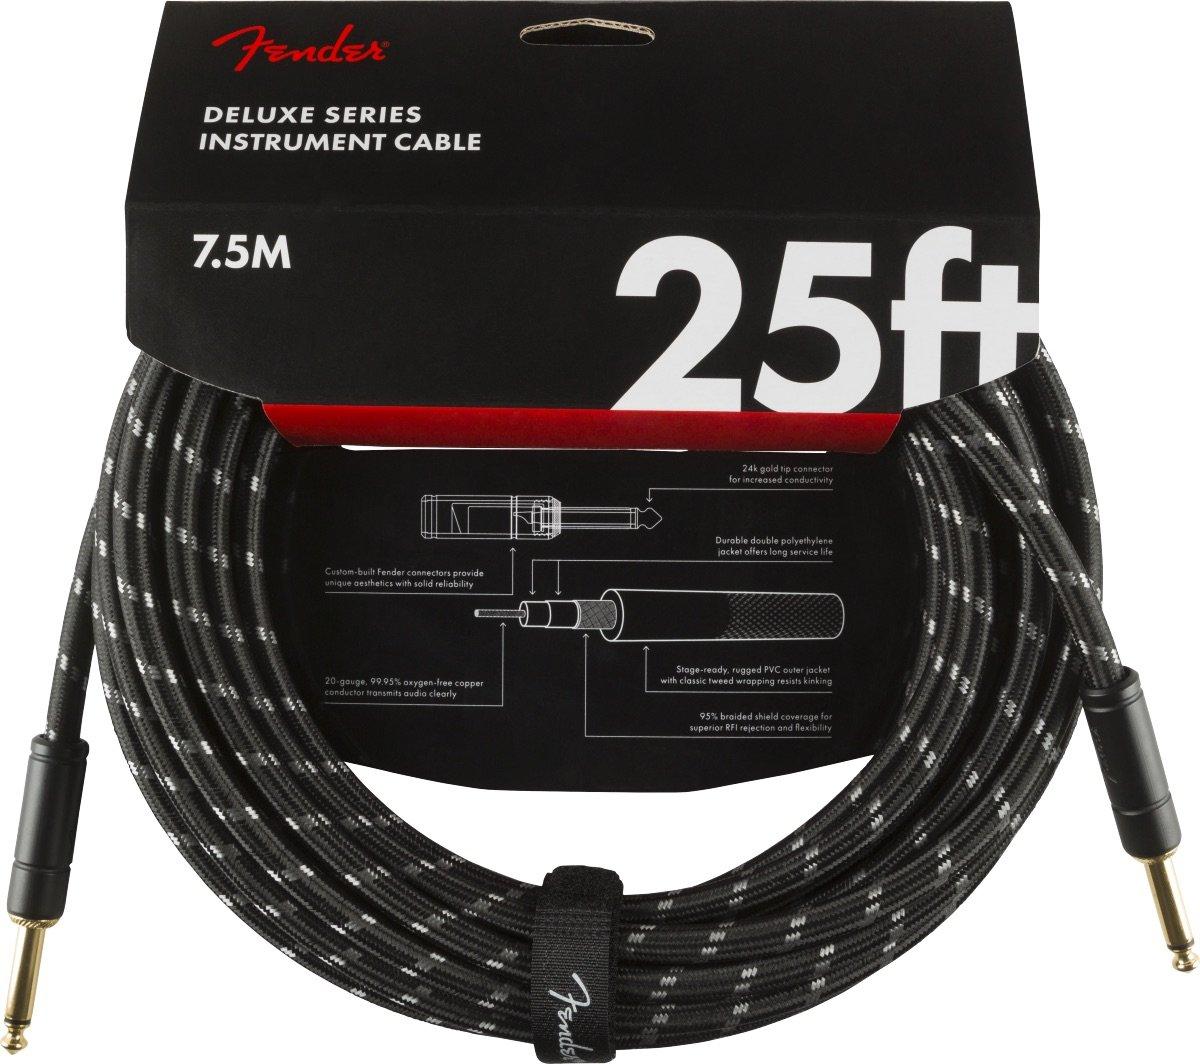 Fender Deluxe Series 25' Instrument Cable-Black Tweed